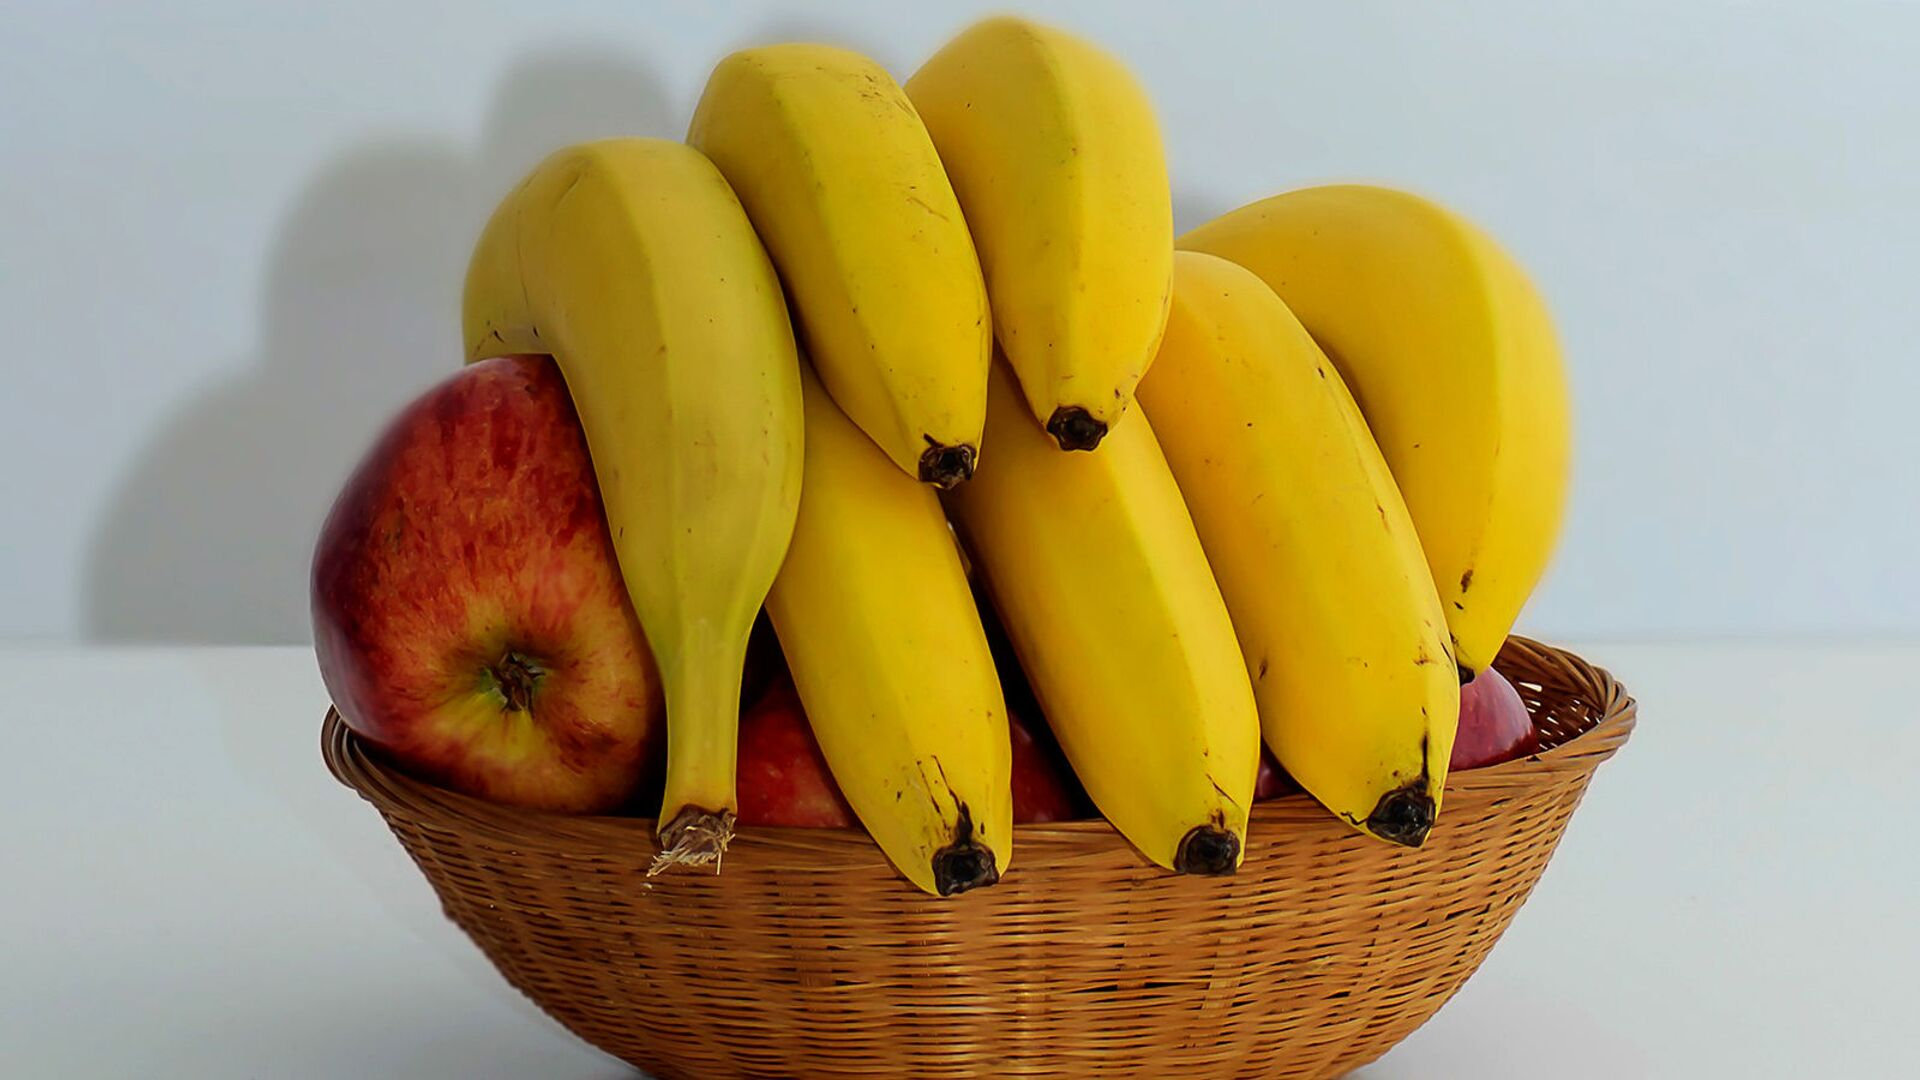 Бананы в корзинке - Sputnik Արմենիա, 1920, 19.03.2021